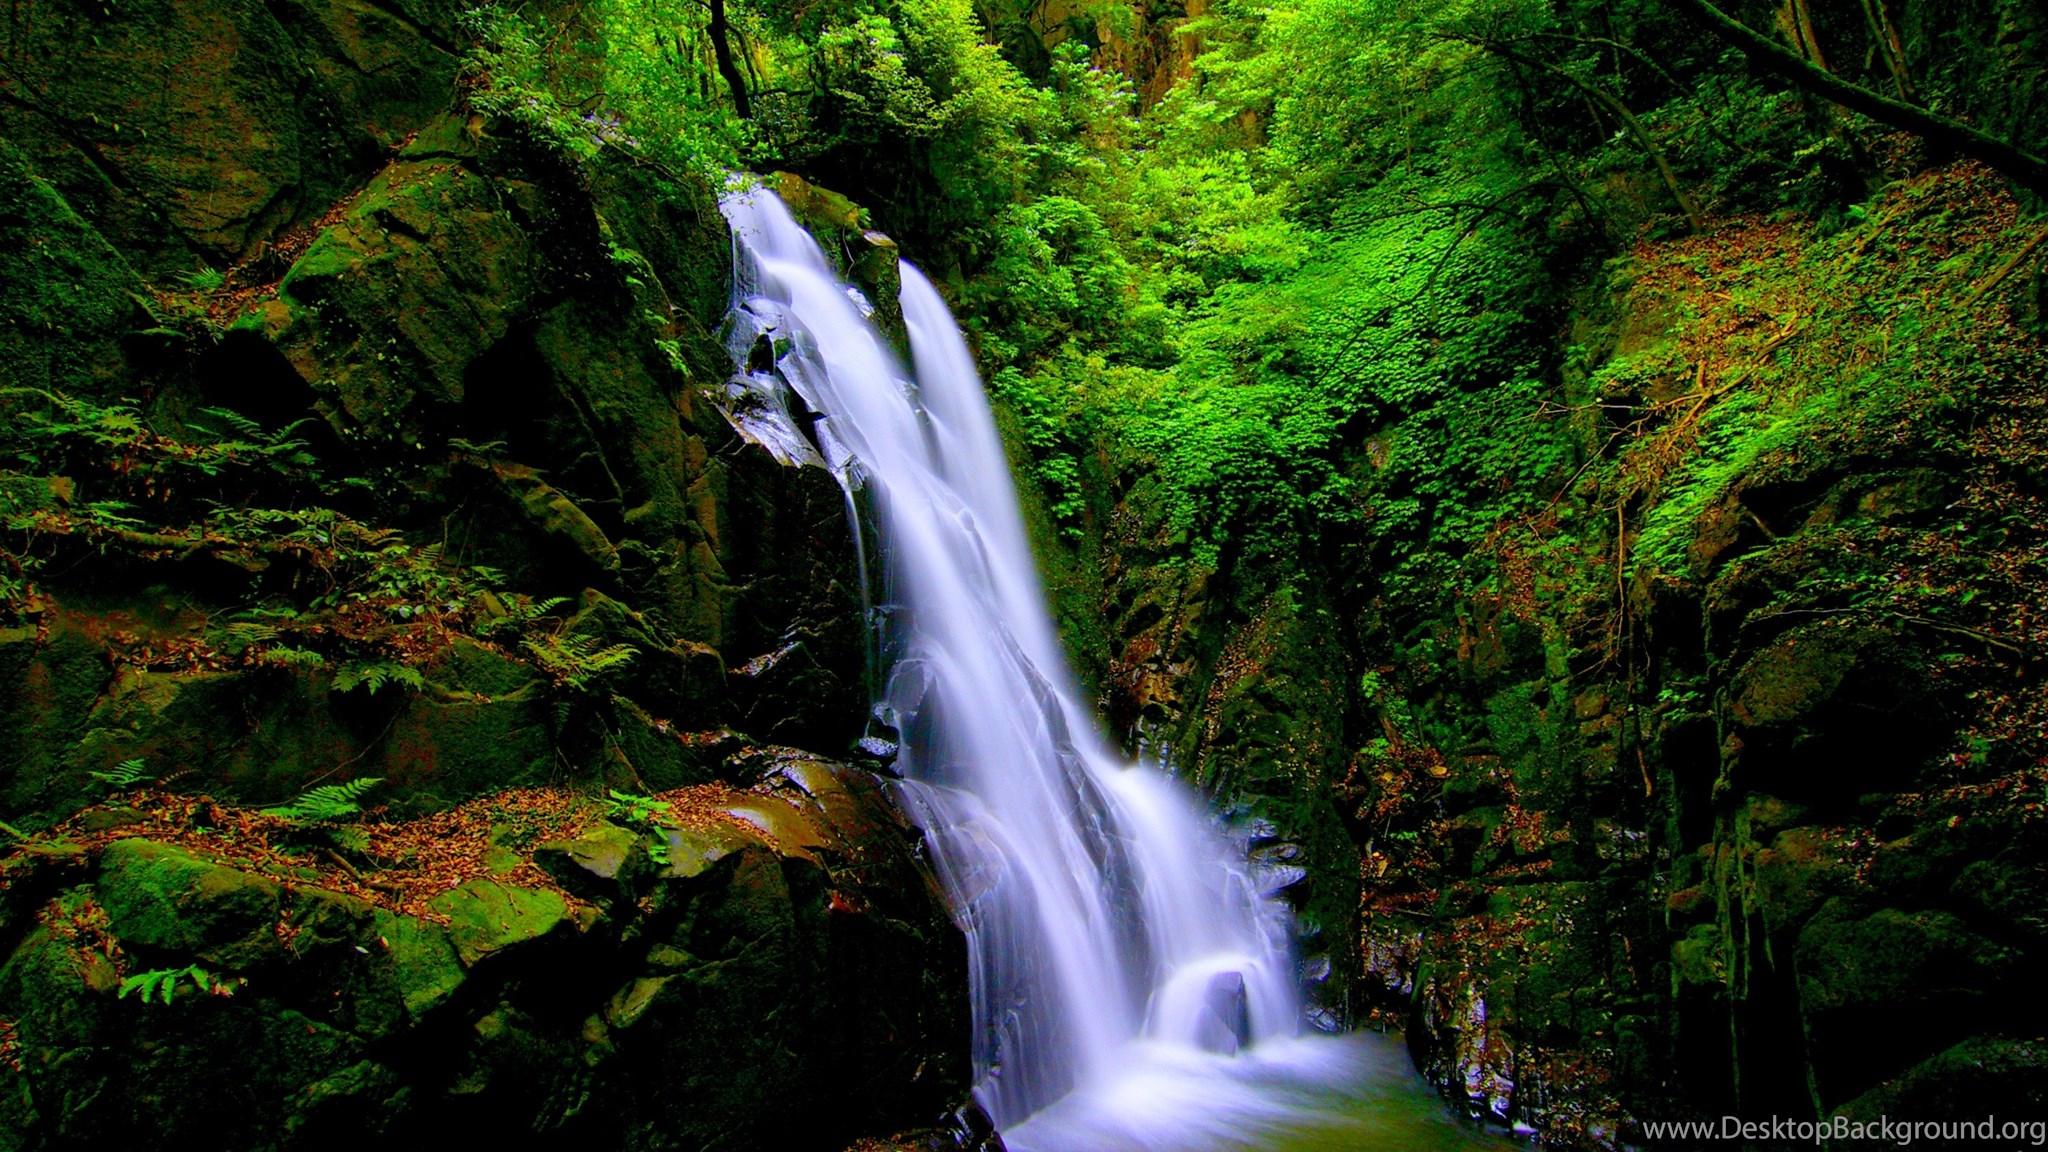 Waterfalls forest waterfalls green nature falls free - Waterfalls desktop wallpaper forest falls ...